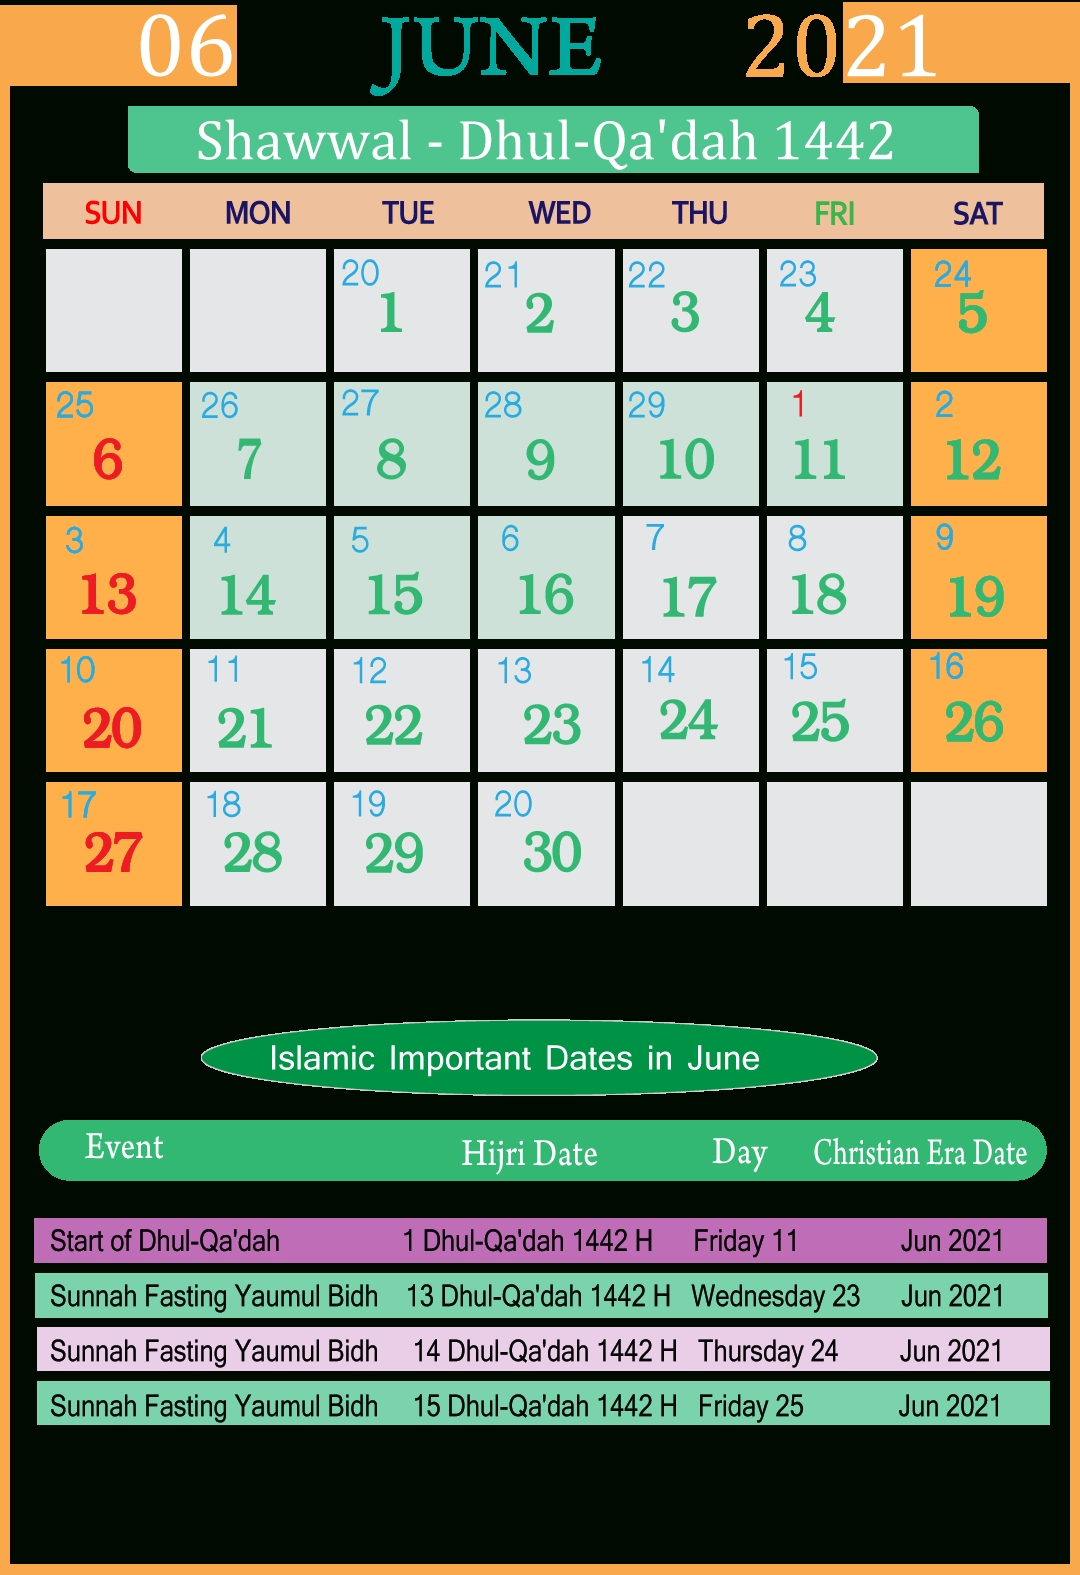 Islamic Calendar 2021 June | Seg Marriage Dates In June 2021 Hindu Calendar